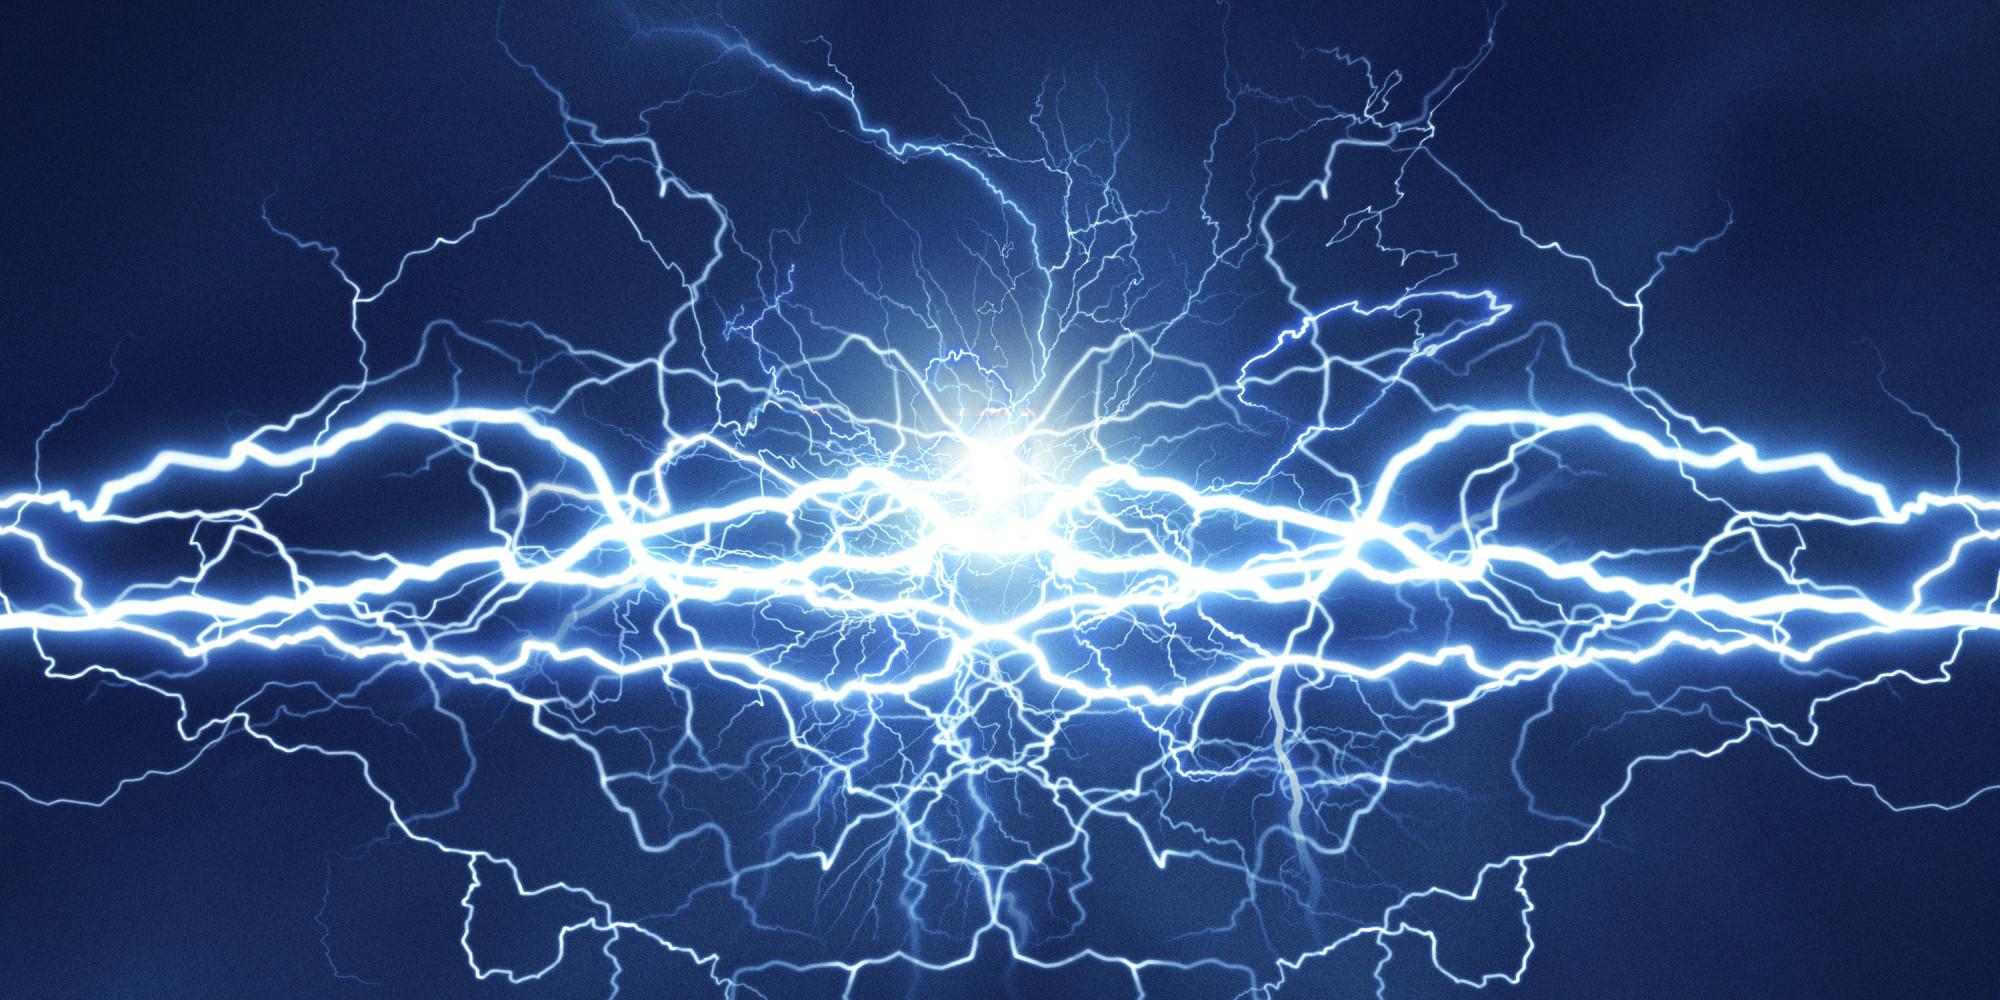 Lightning - Wikipedia